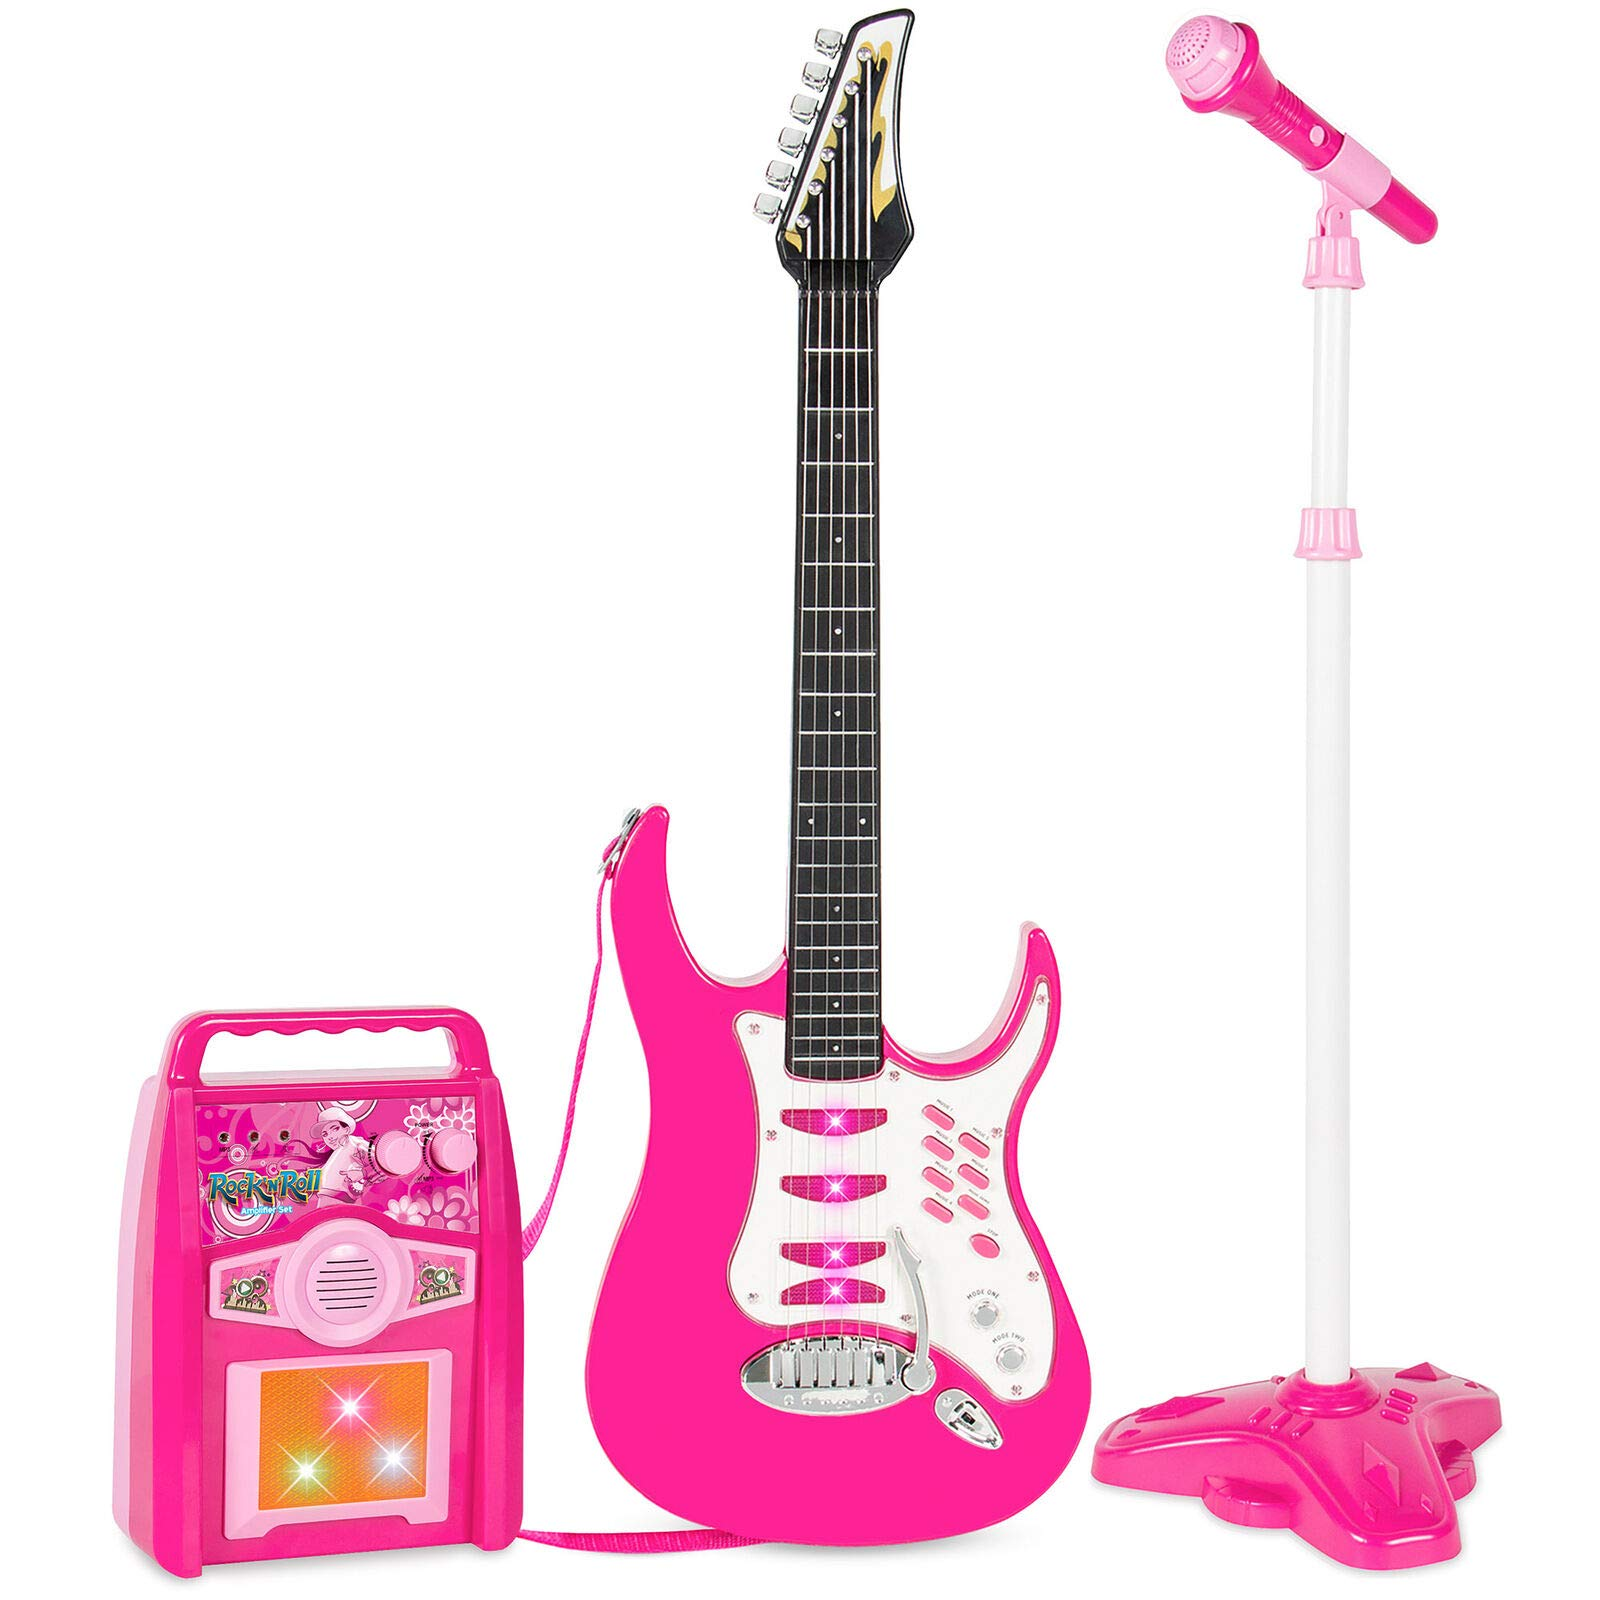 Lonestar Wholesalers Pink Kids Electric Guitar Toy Play Set w/ 6 Songs Microphone Amp by Lonestar Wholesalers